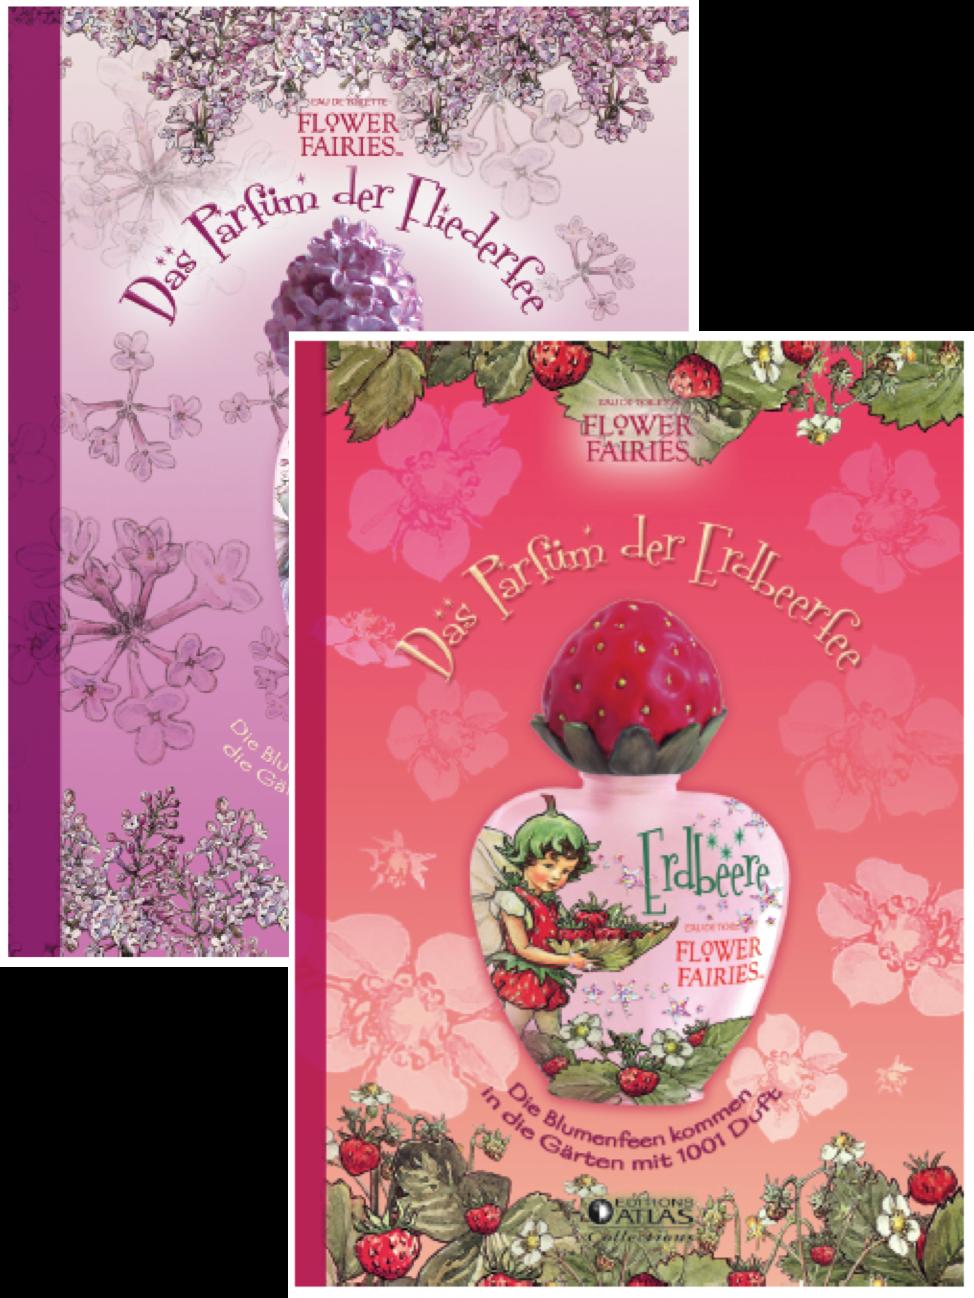 2 Bücher, Übersetzung aus dem Englischen, 2008 (Éditions Atlas)